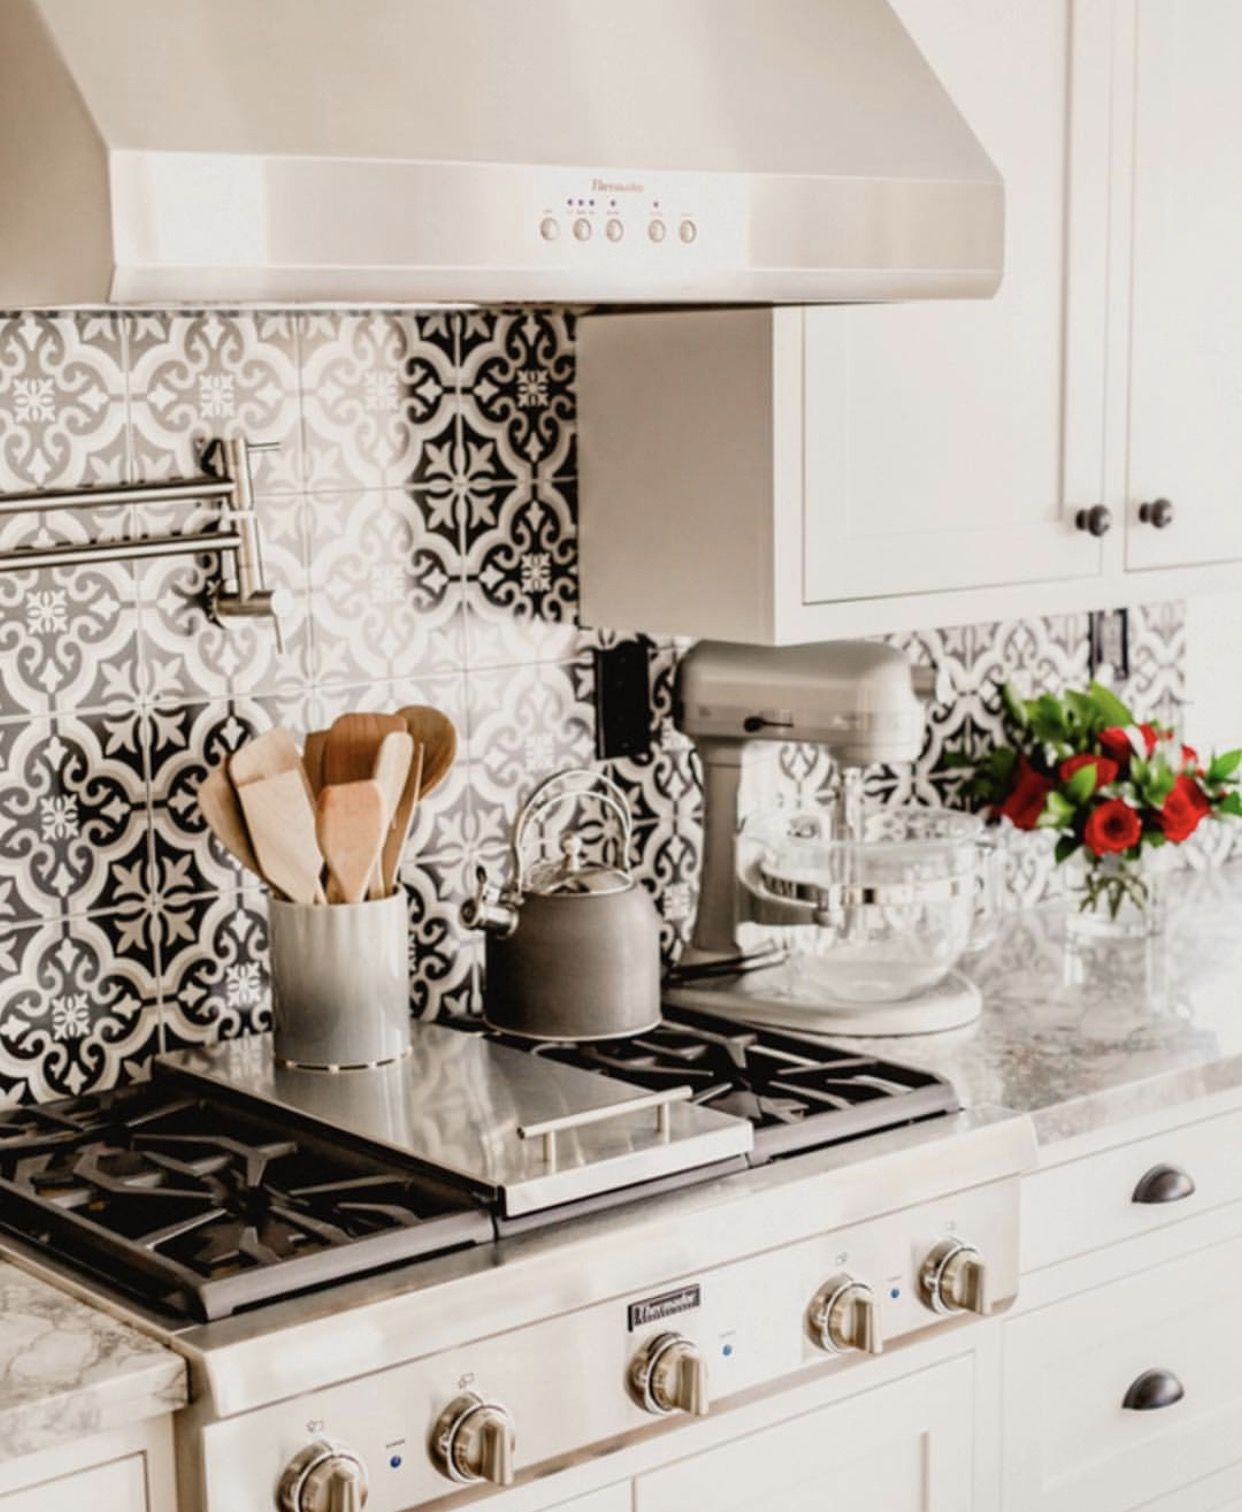 this kitchen backsplash is amazing black and white tile kitchen backsplash designs modern on farmhouse kitchen black and white id=65017